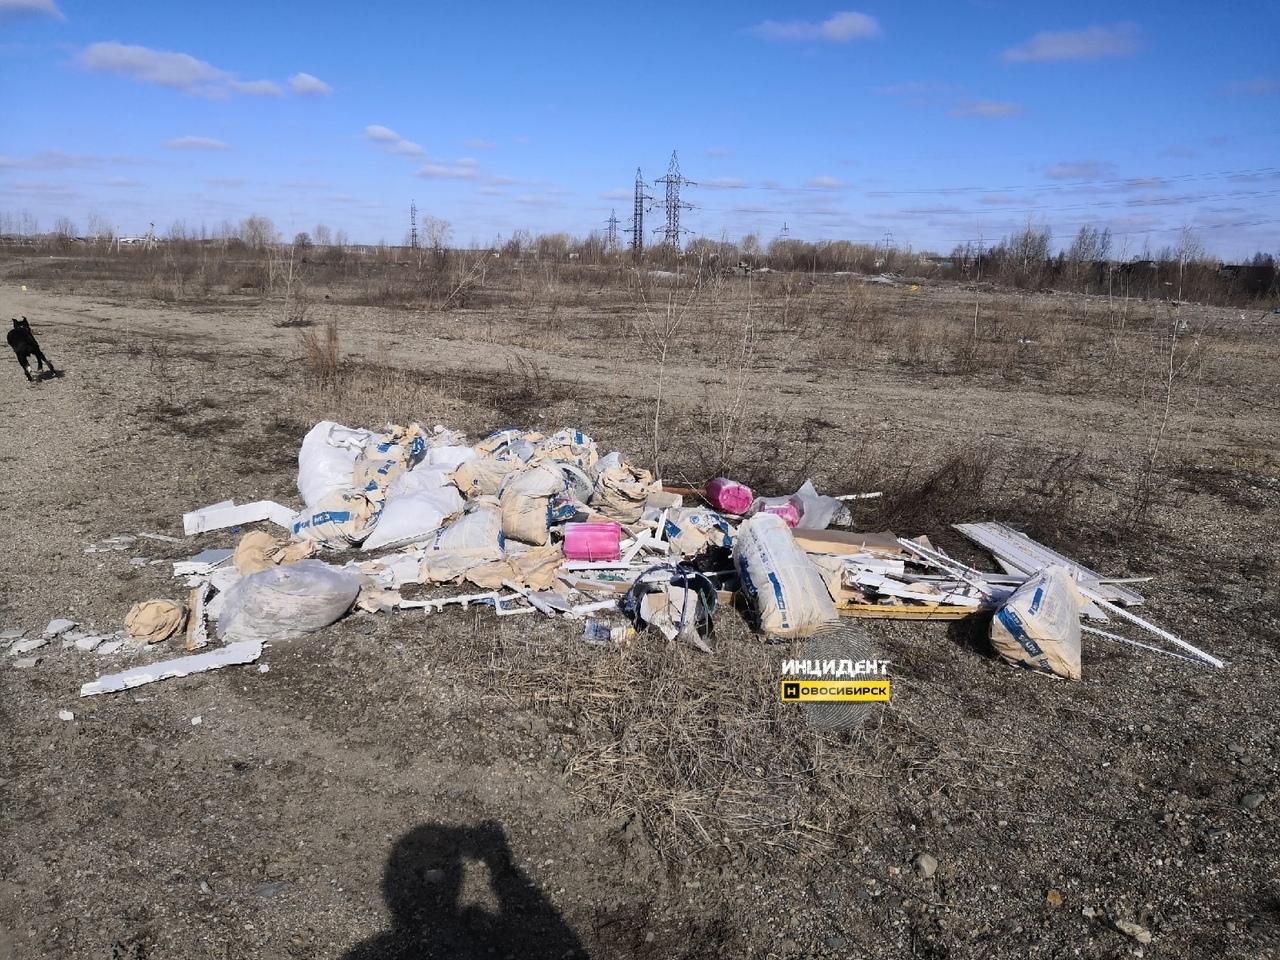 фото Горы мусора на берегу озера возмутили жителей Новосибирска 2